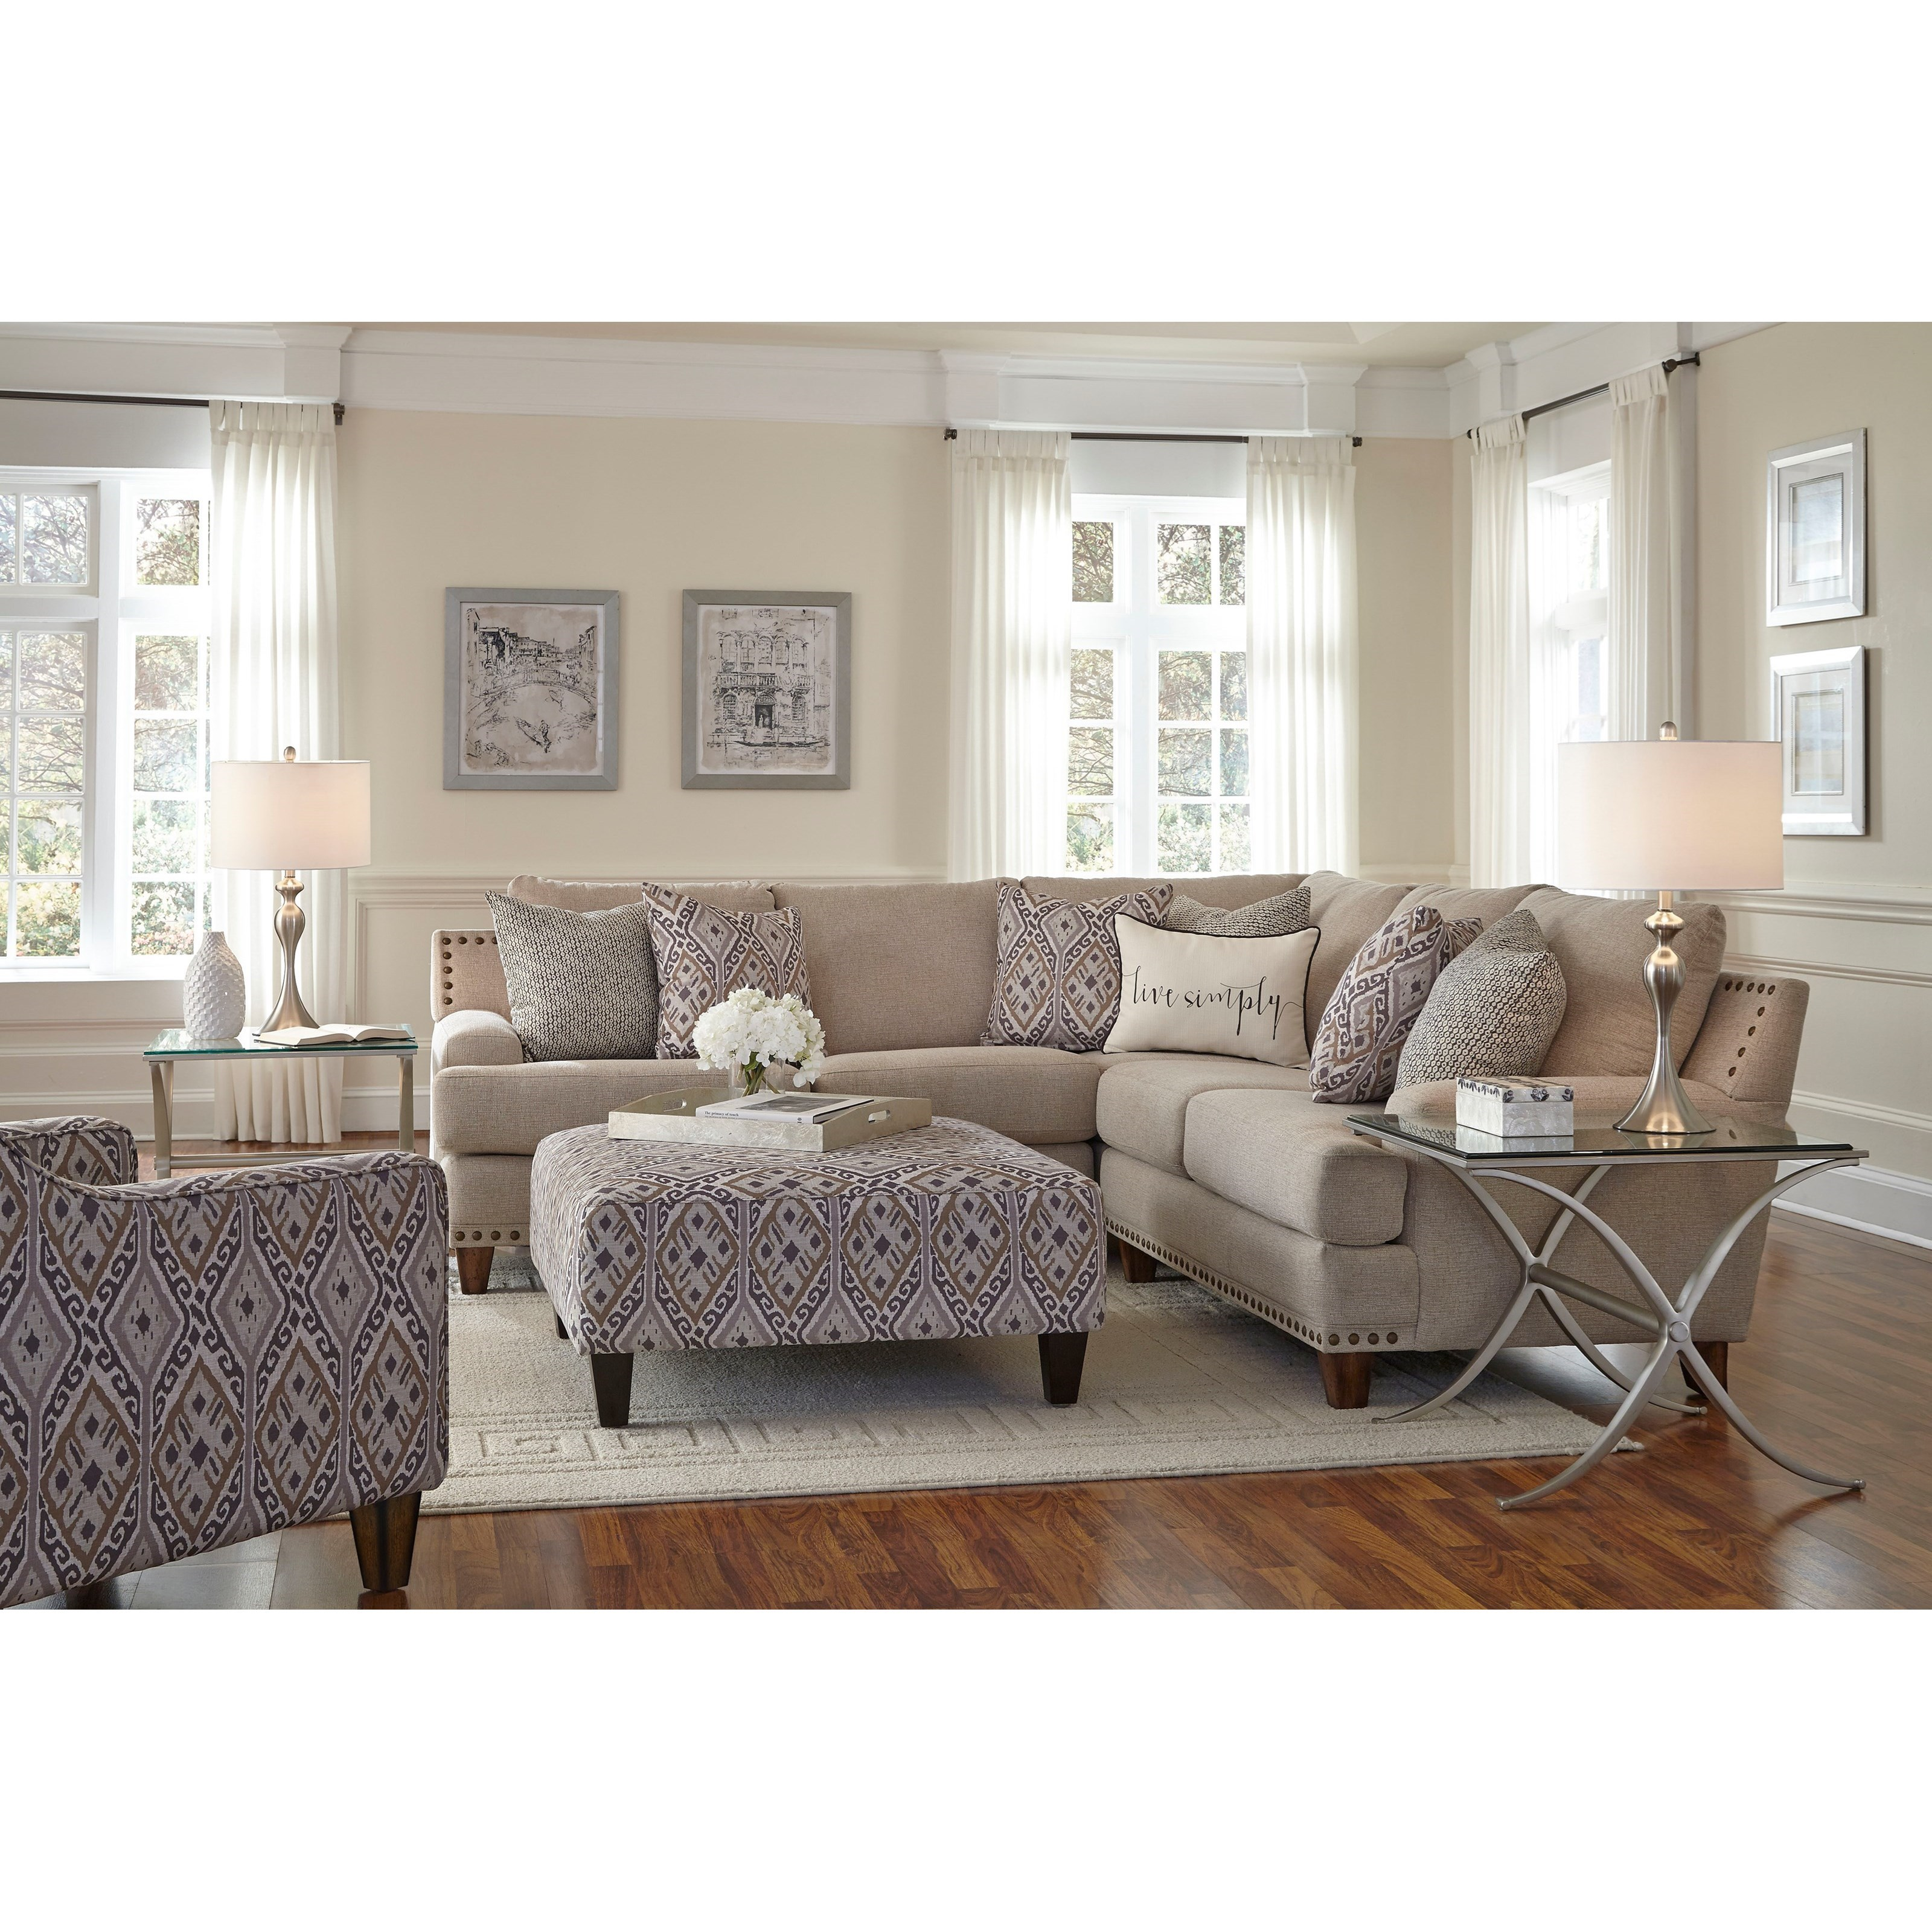 Franklin Anna Stationary Living Room Group Miskelly Furniture Stationary Living Room Groups